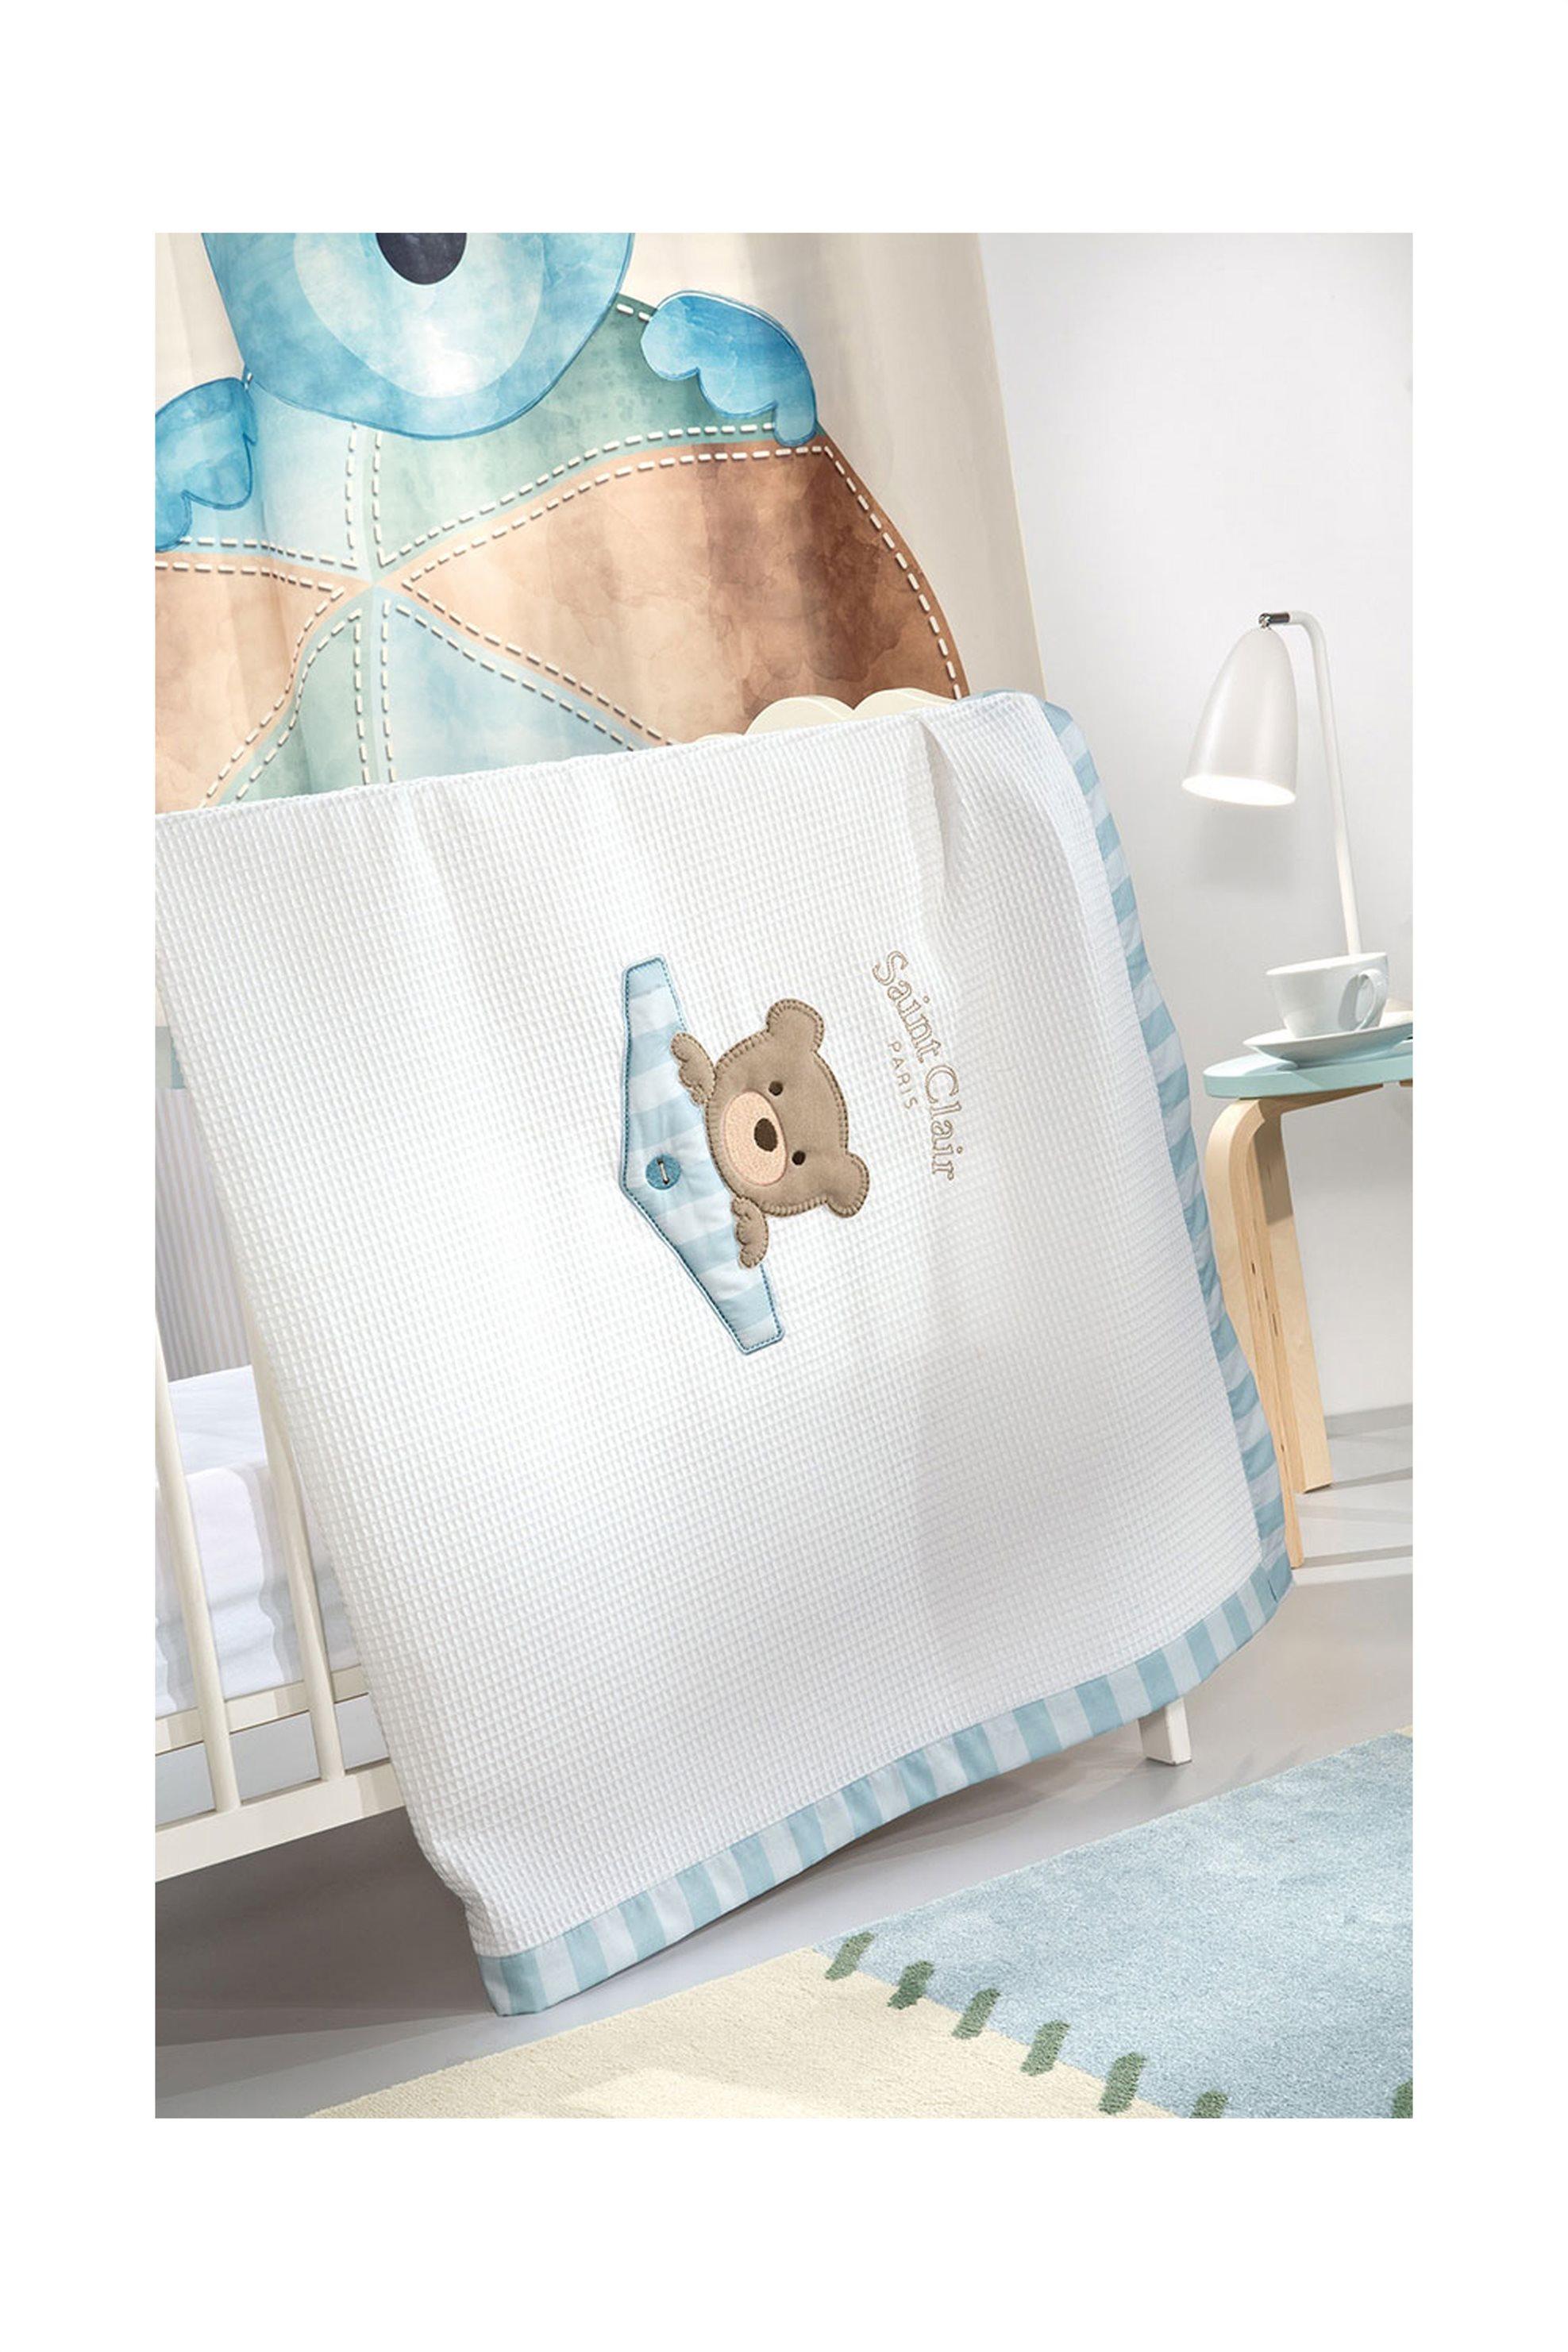 Saint Clair Paris βρεφική κουβέρτα πικέ Teddy Sky (110x150) - 1713090215009 home   παιδια   κουβέρτες